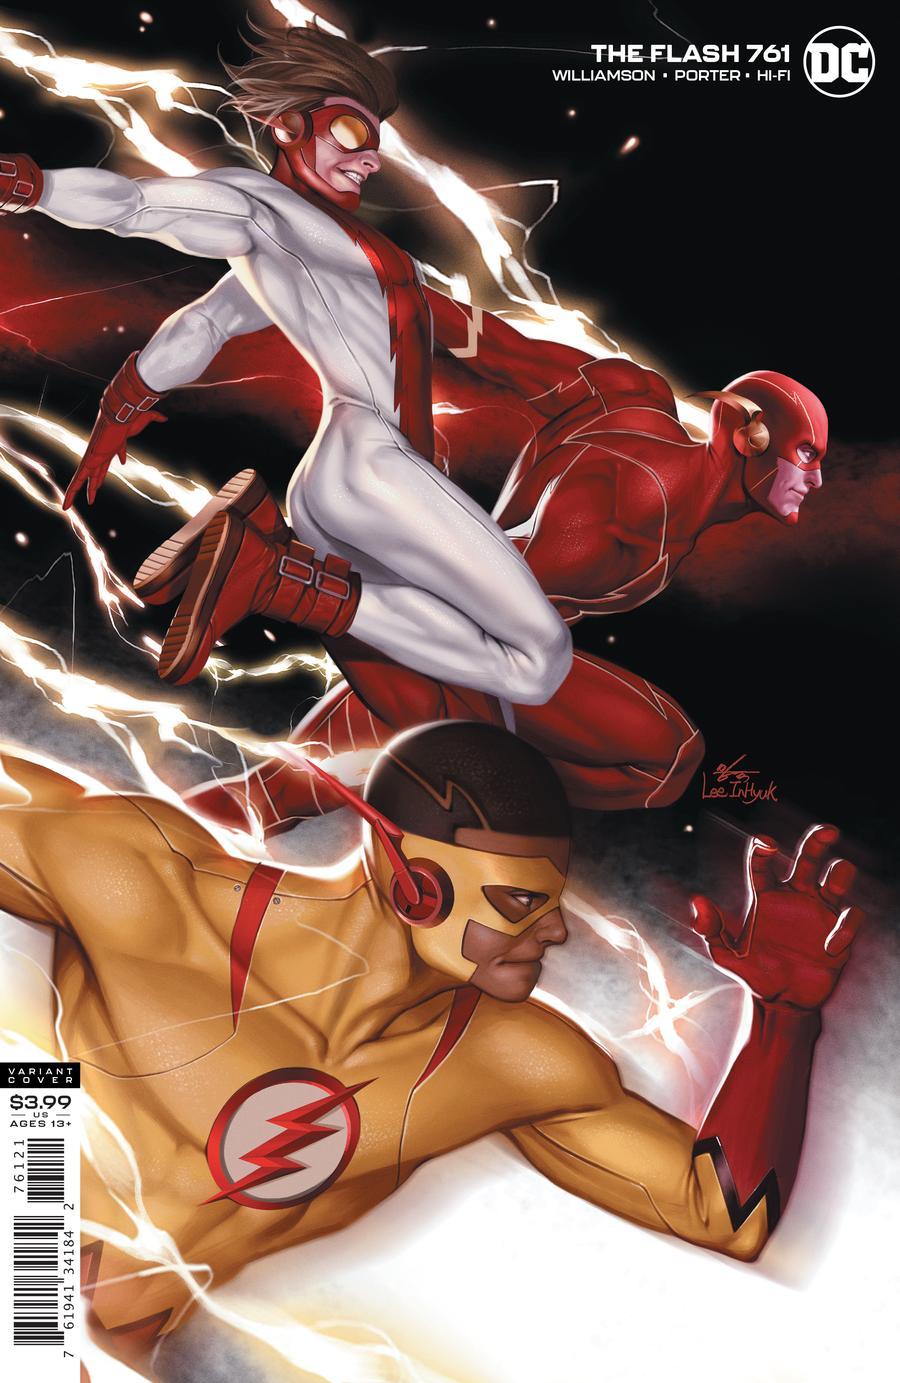 Flash Vol 1 #761 Cover B Inhyuk Lee Variant